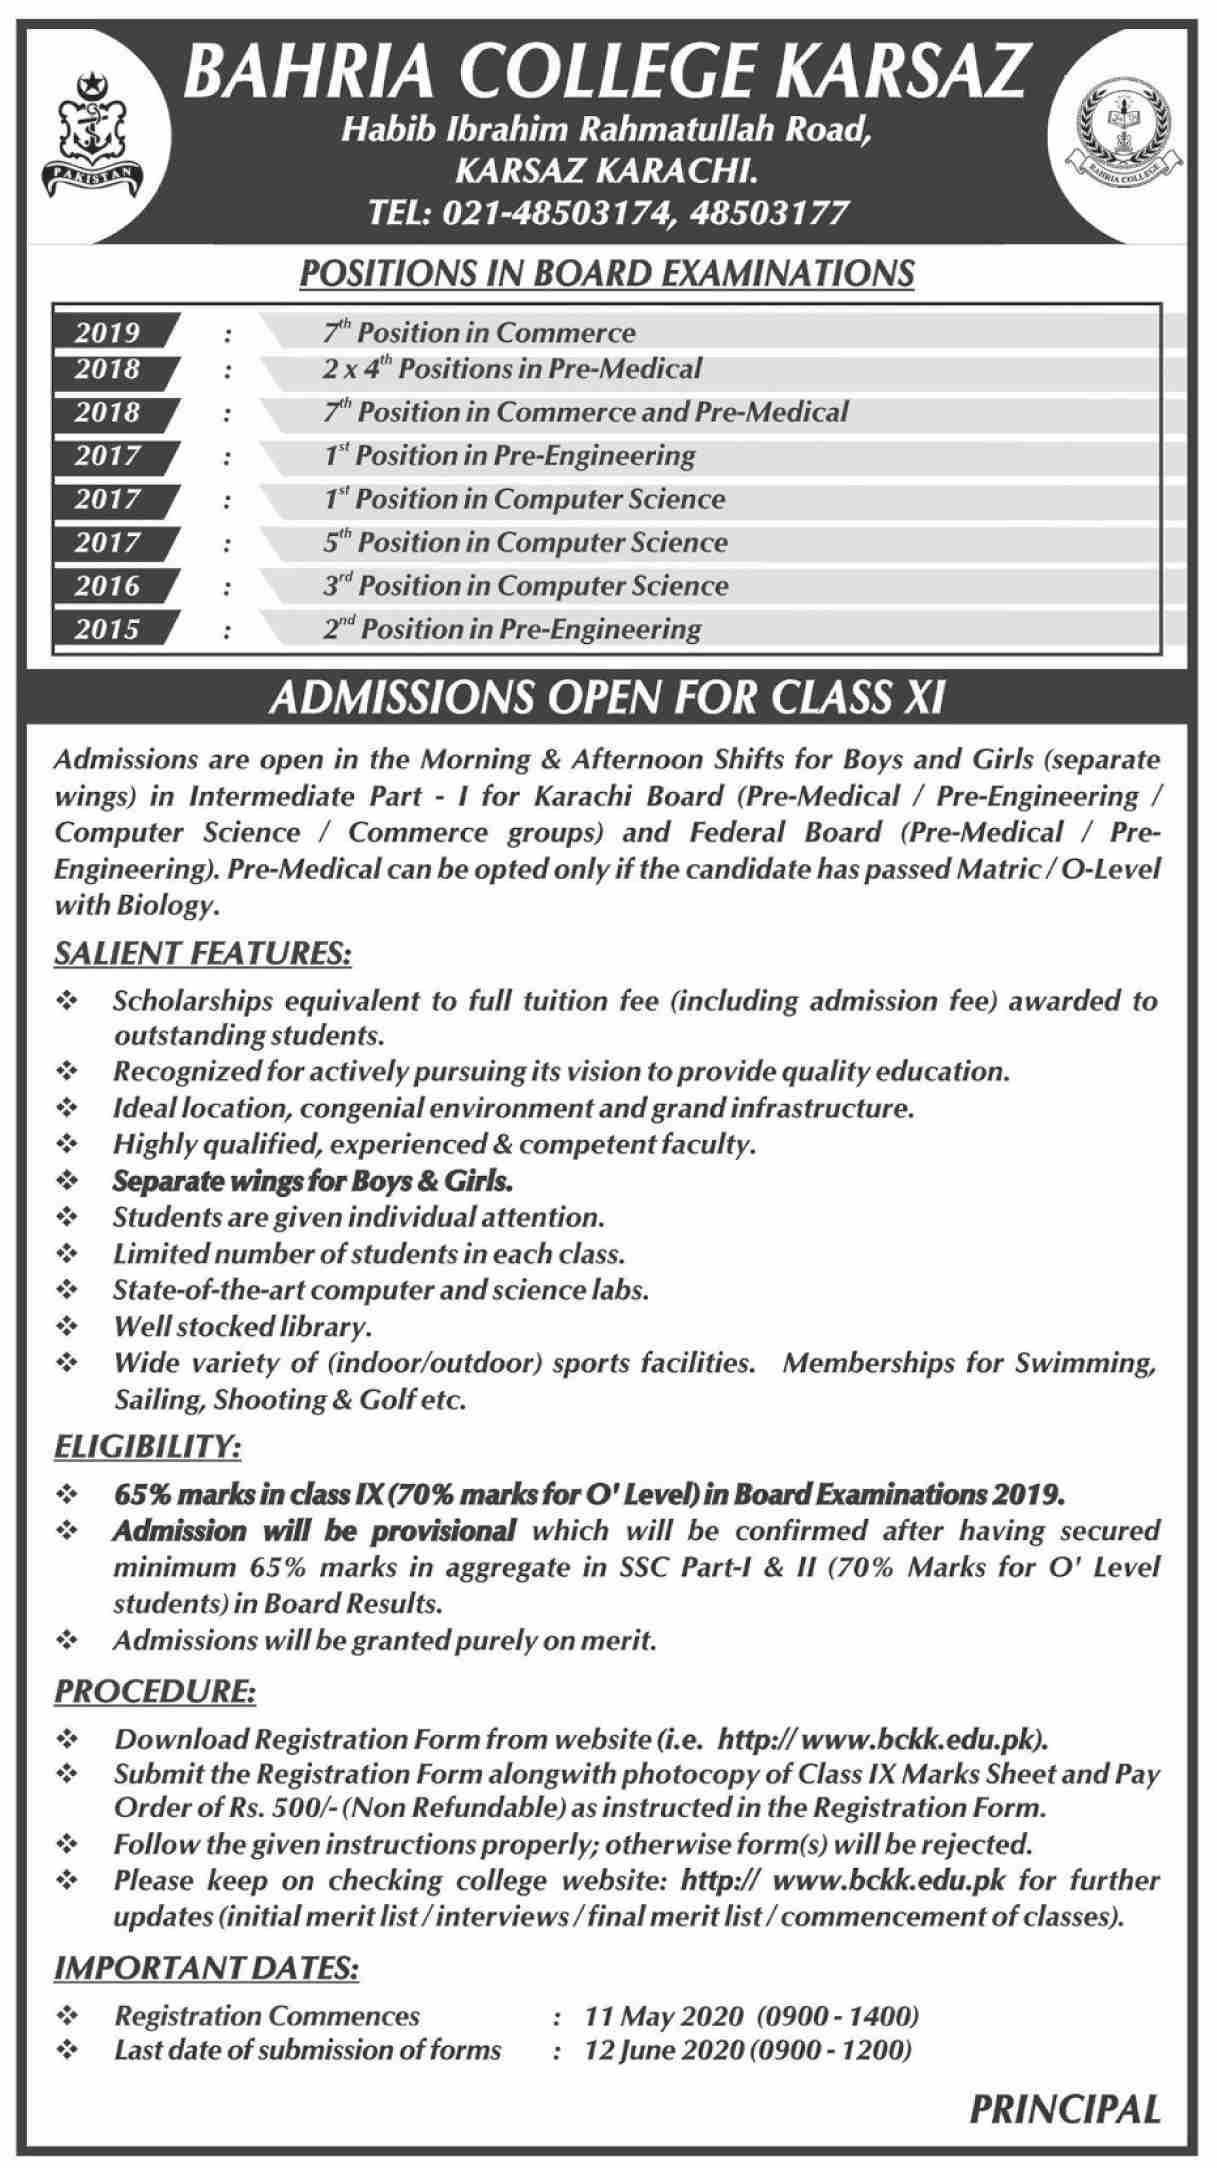 Bahria College Karachi Admissions